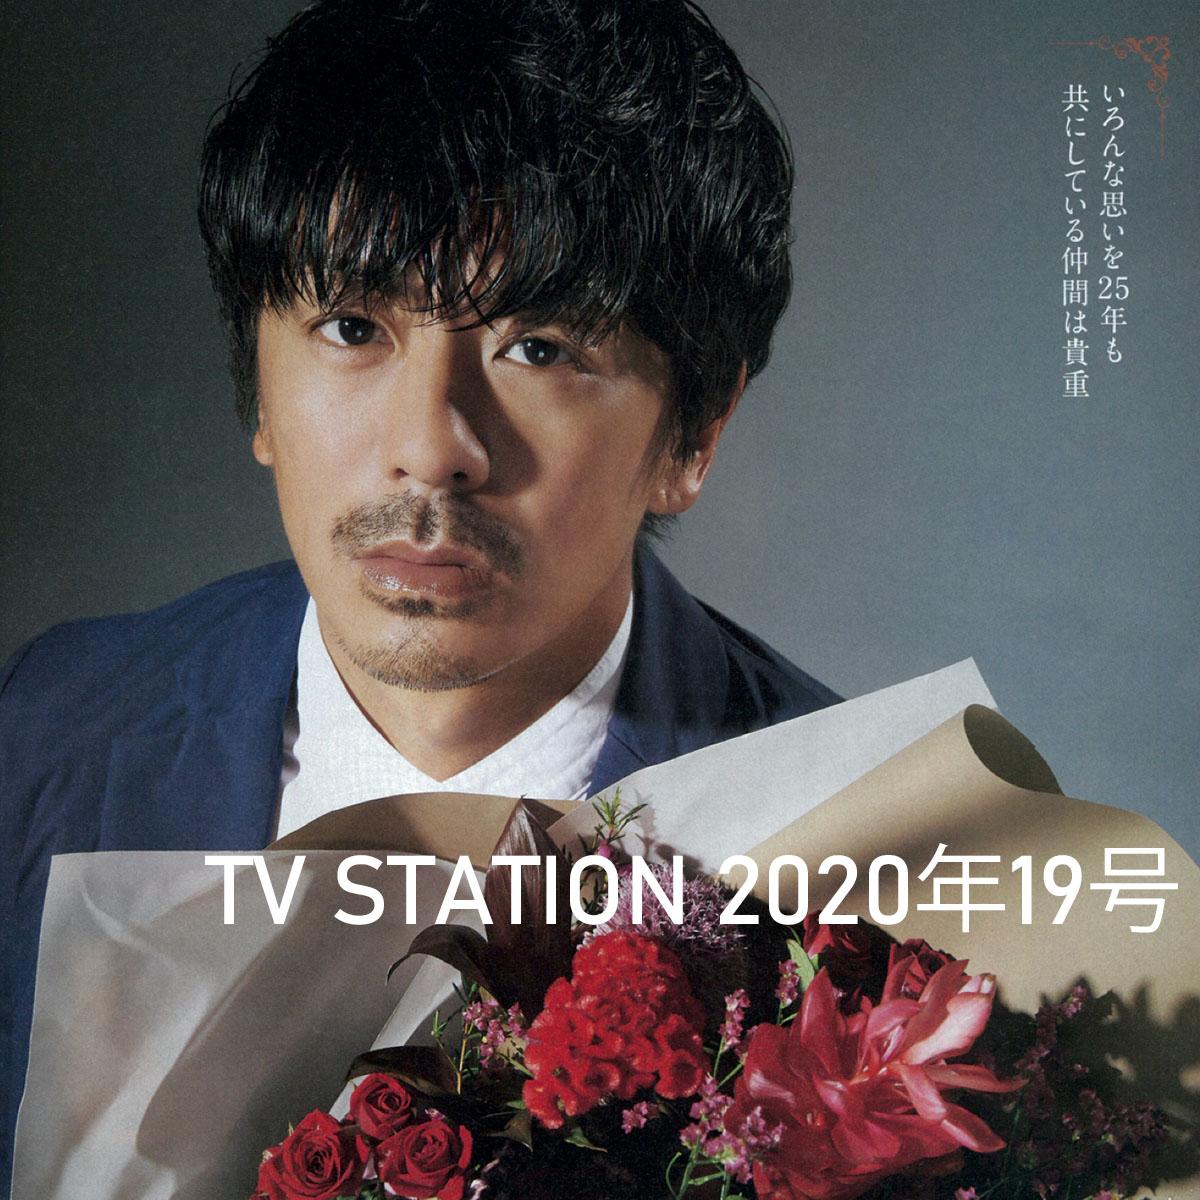 TV stationにて、V6 / 森田剛さんに着用いただいております